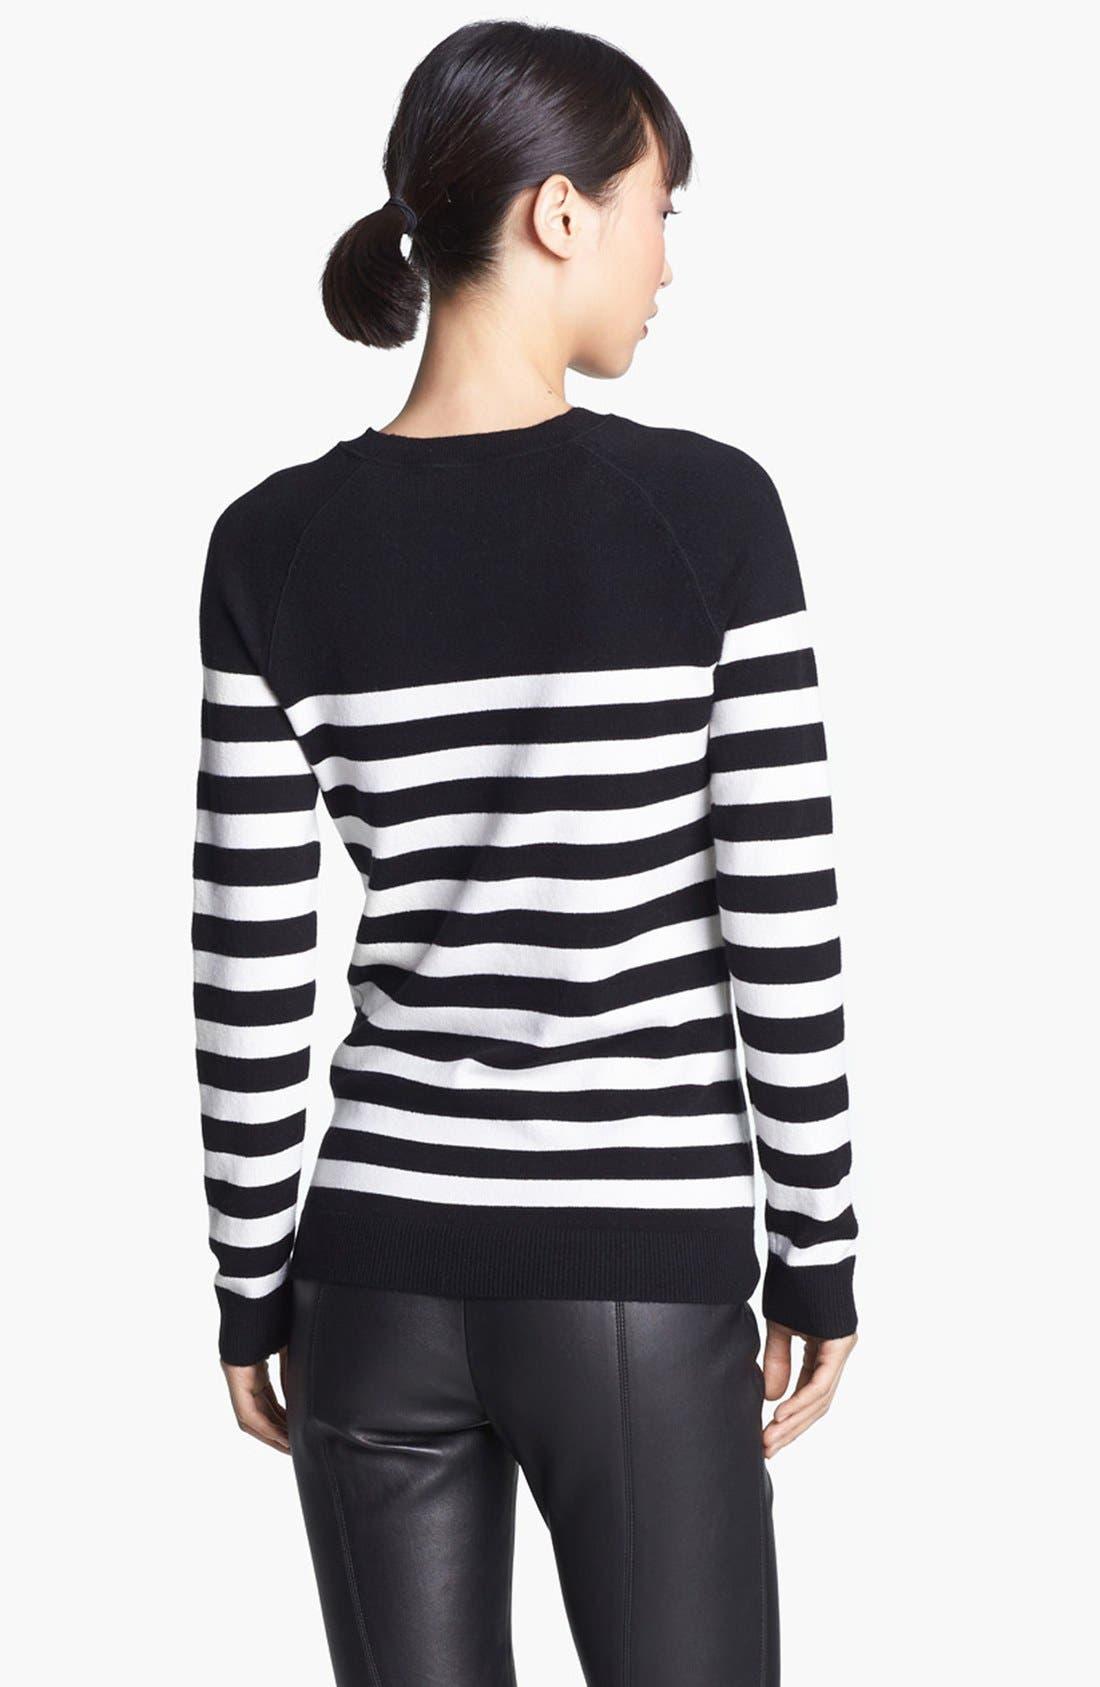 Alternate Image 3  - Miss Wu 'Zucca' Stripe Cashmere Blend Sweater (Nordstrom Exclusive)